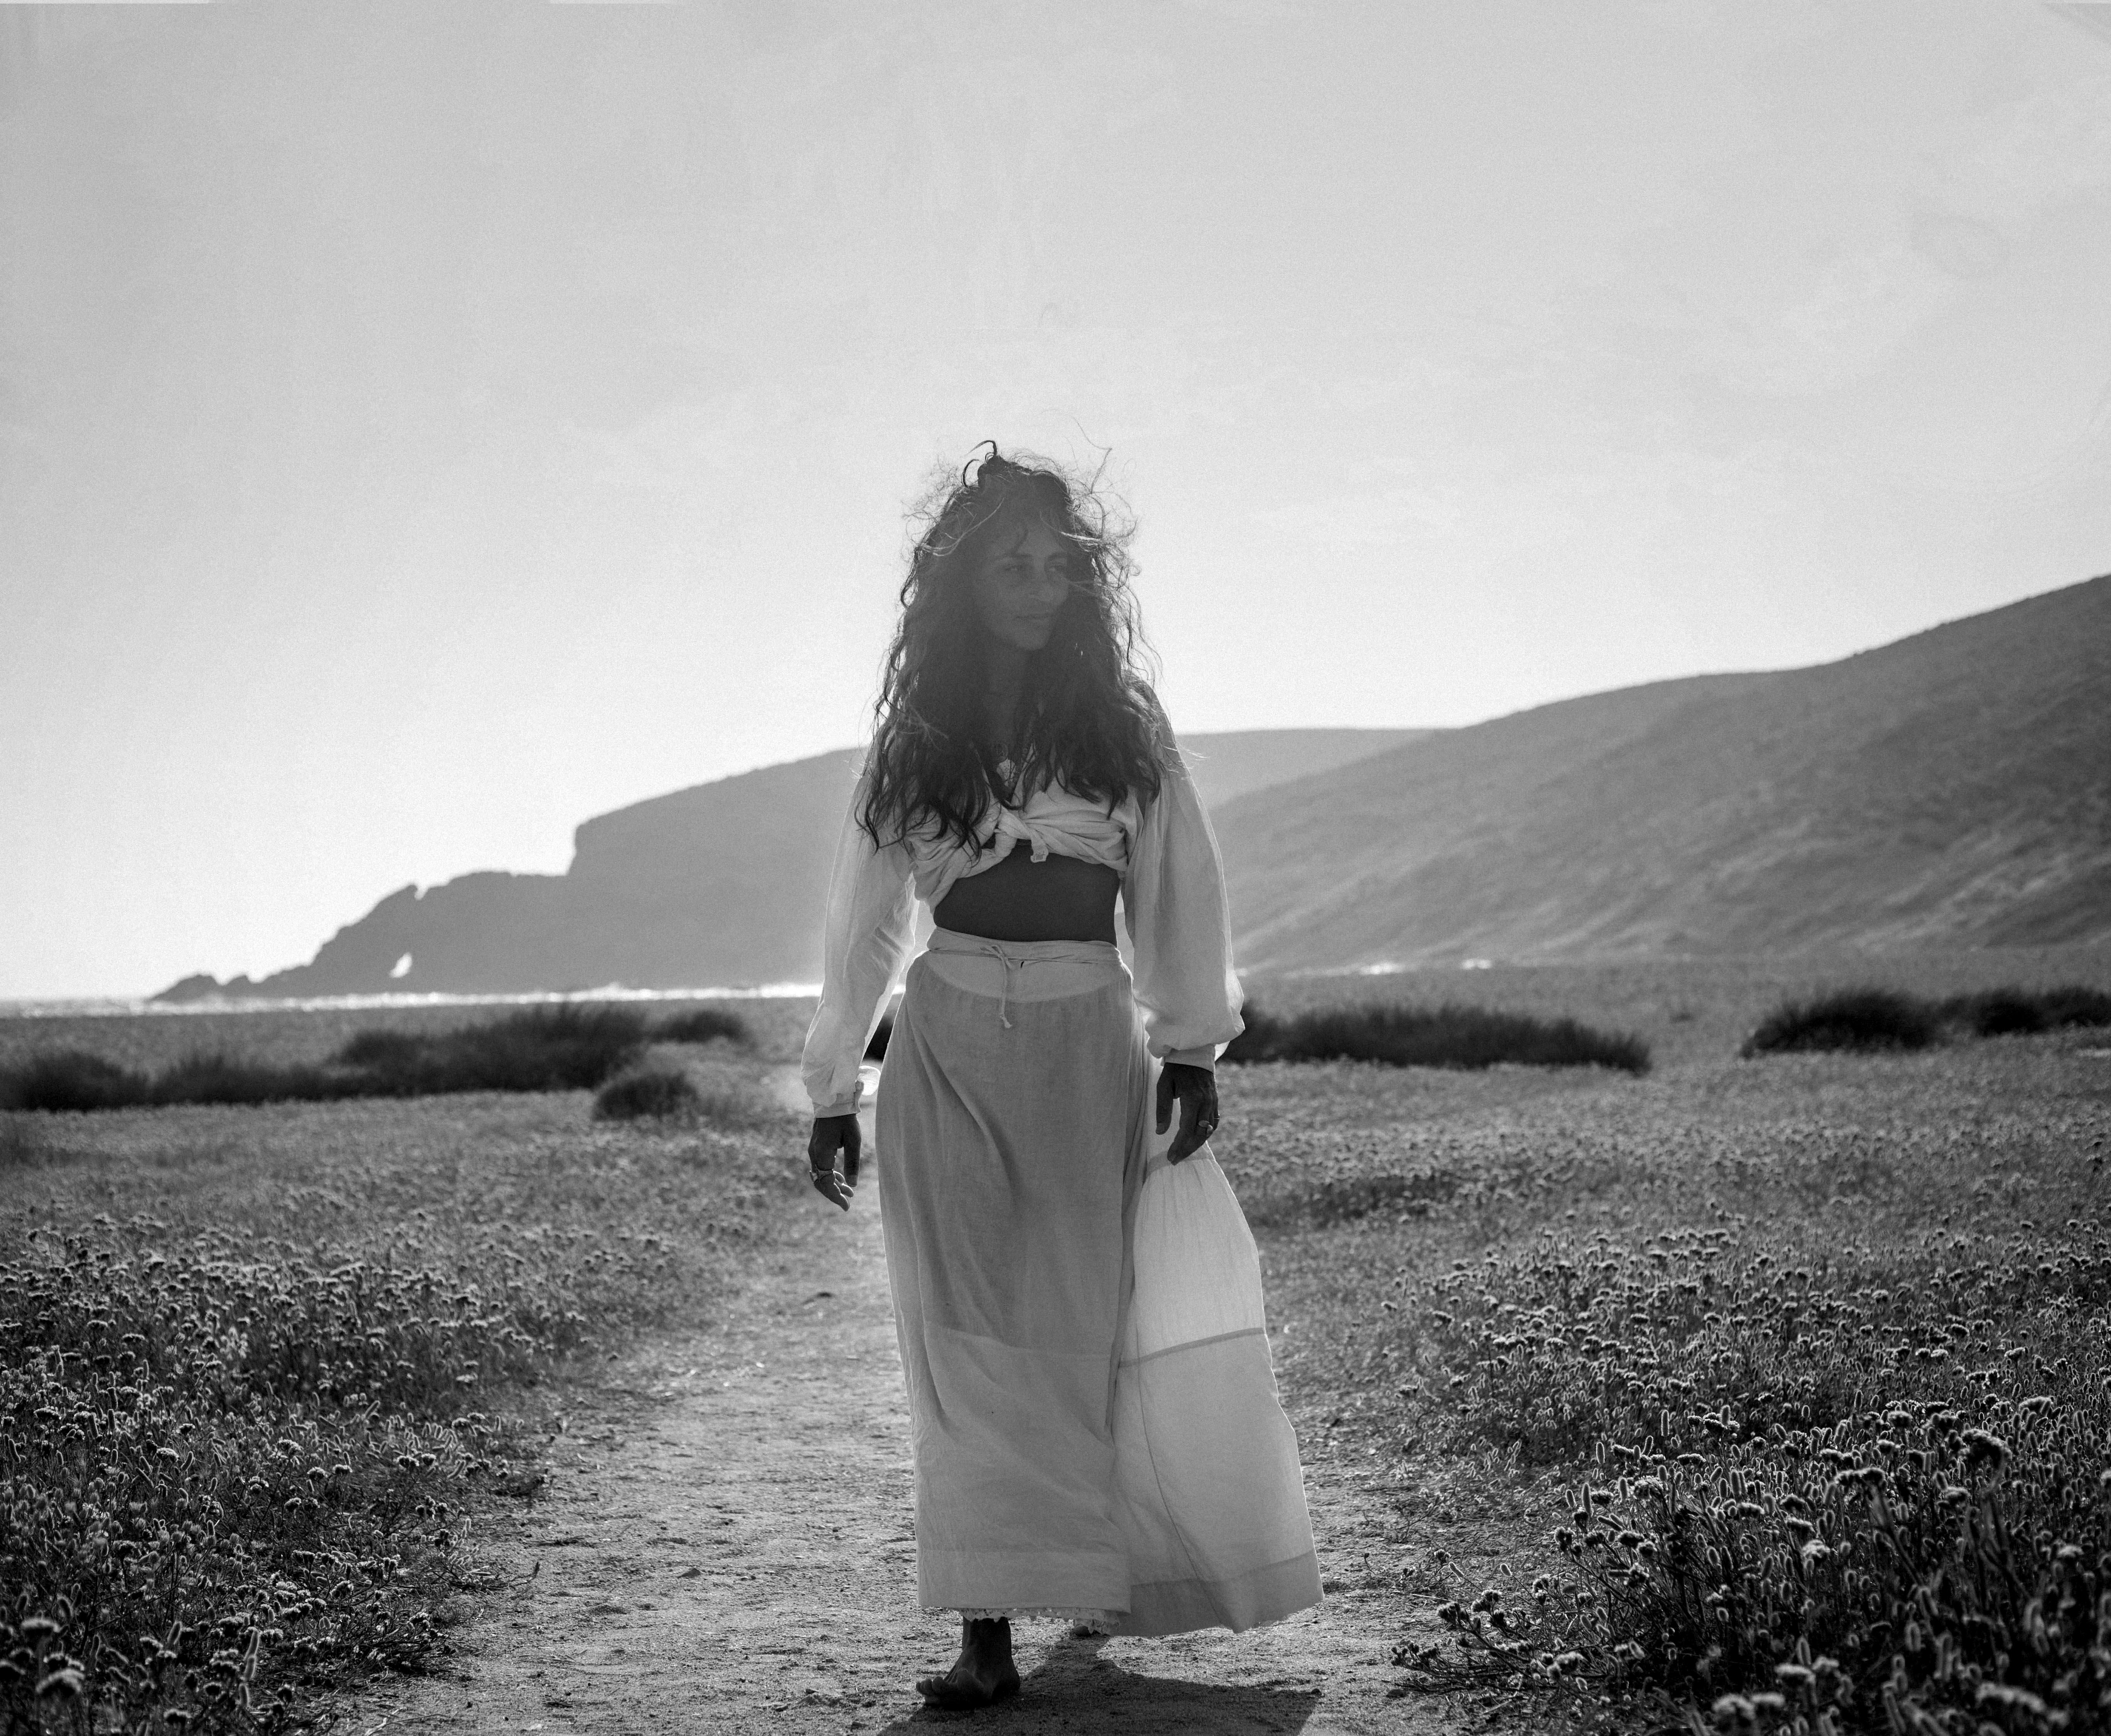 Leila Sadeghee